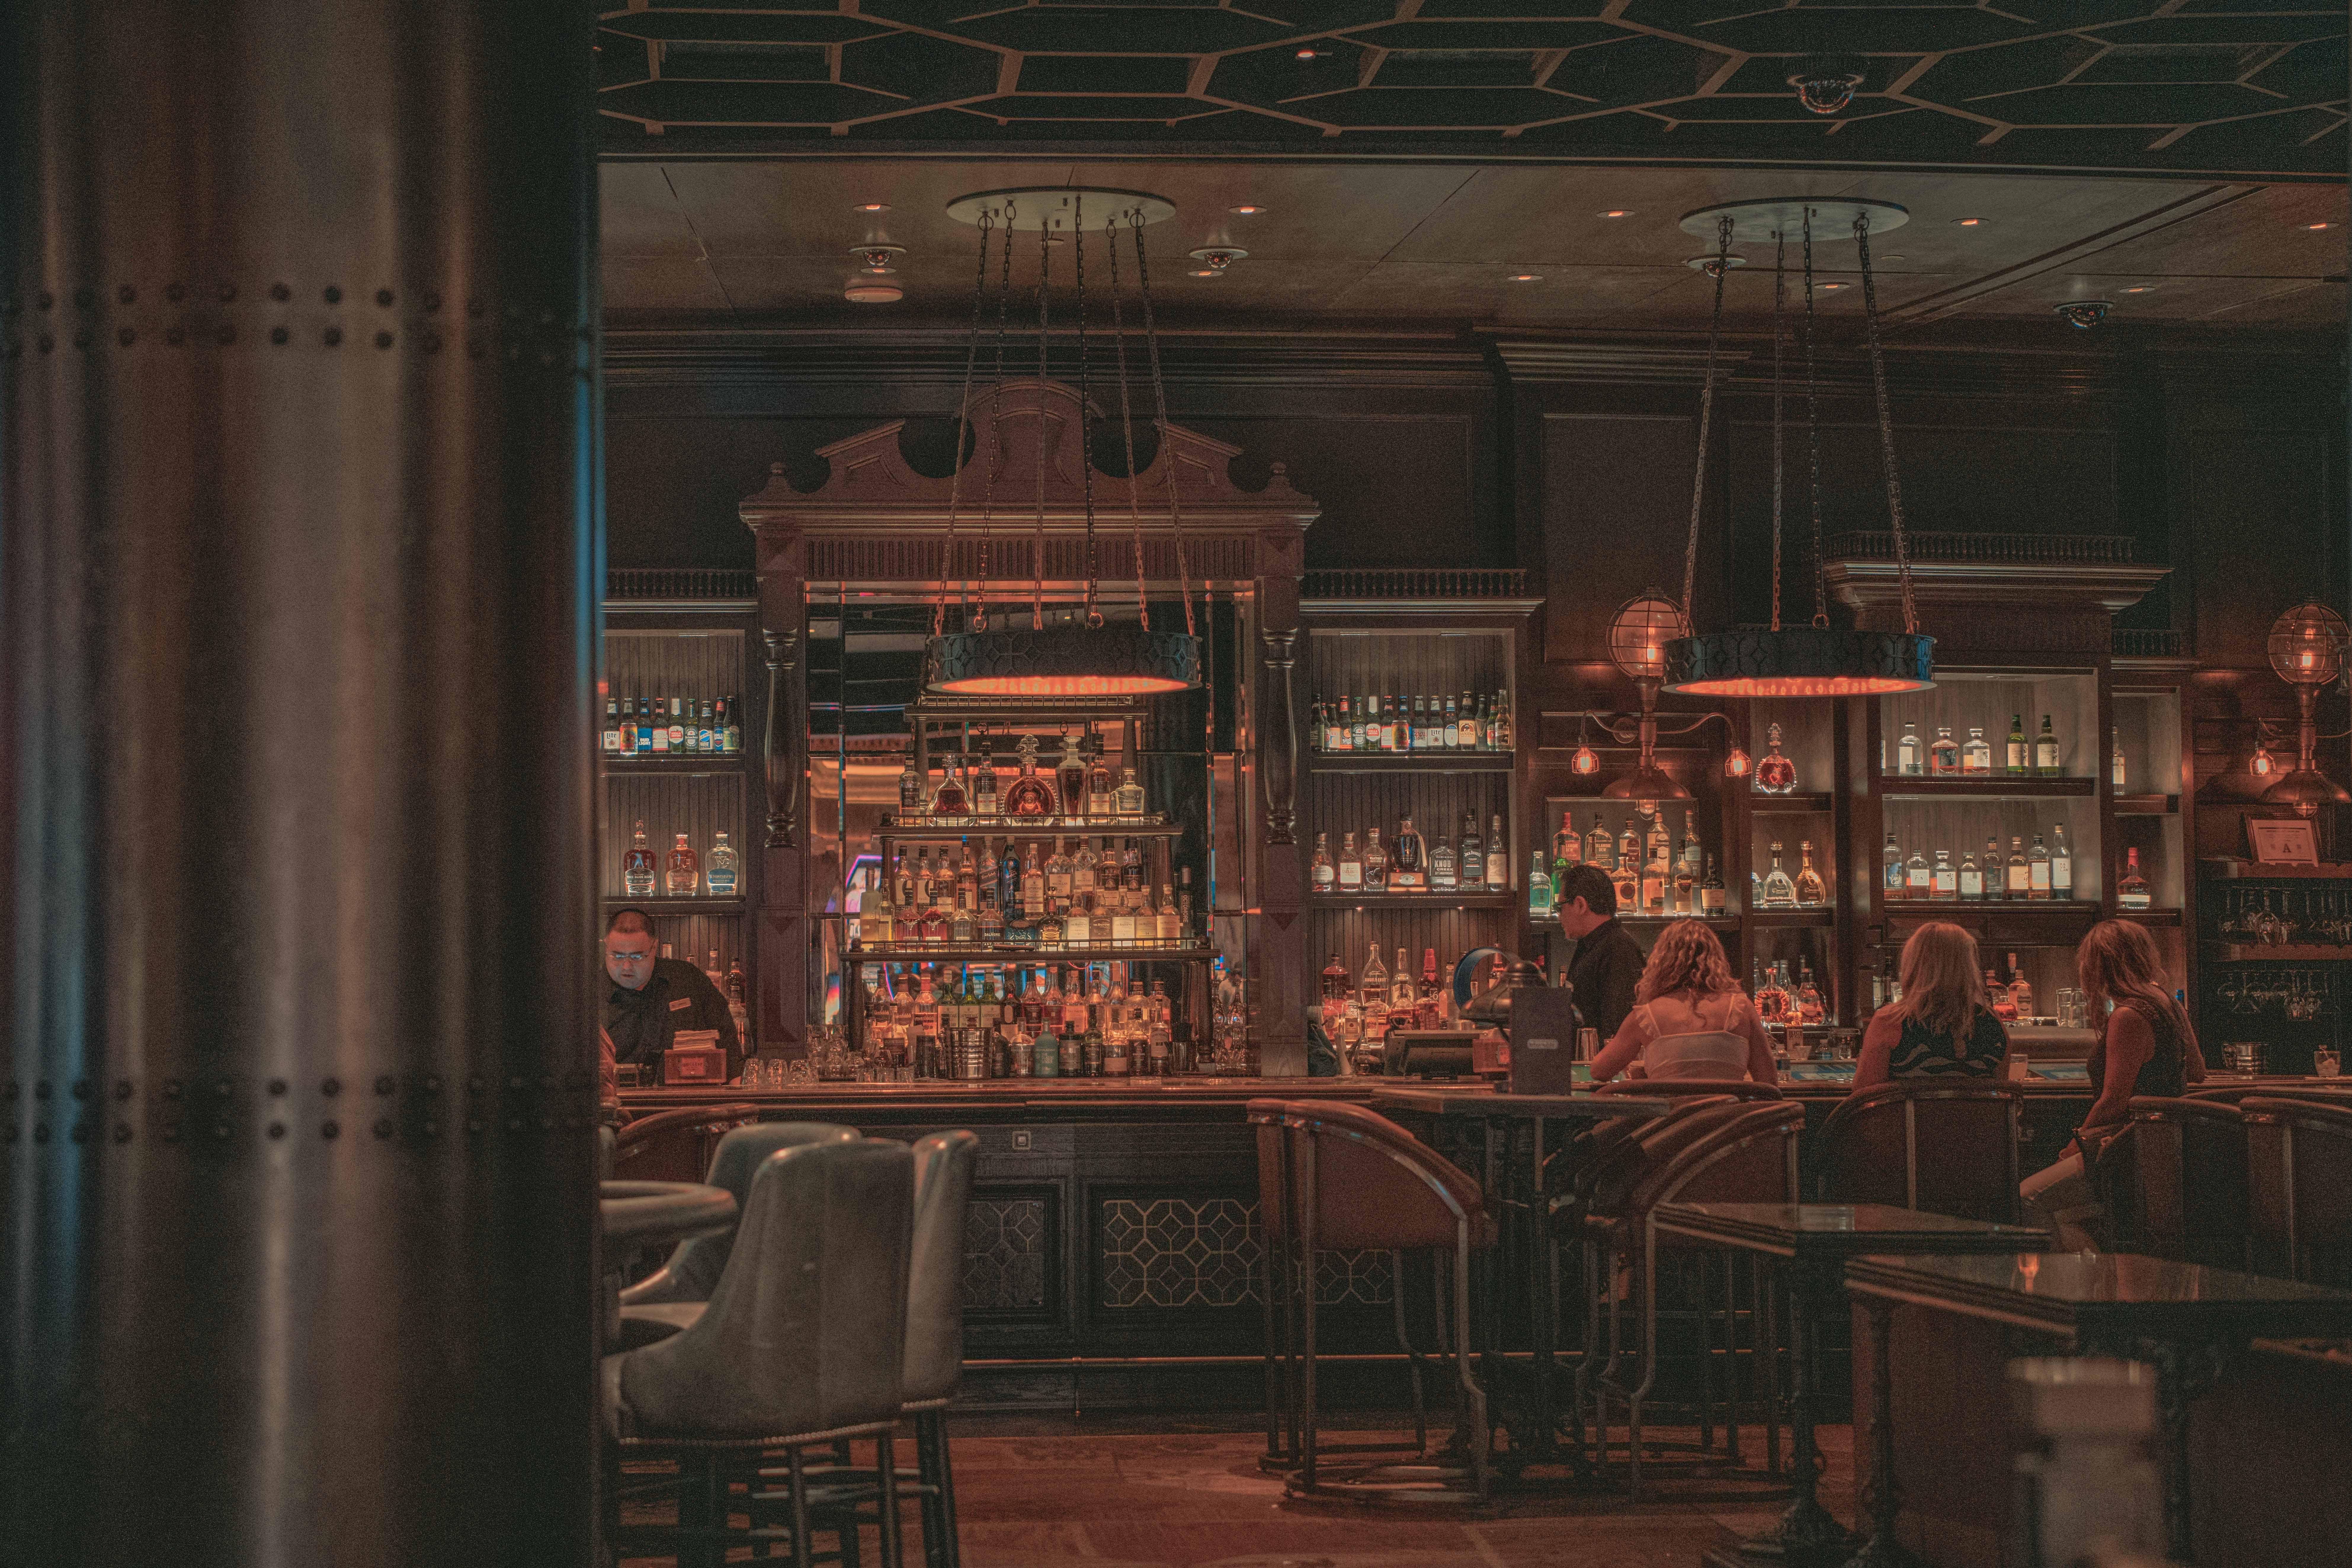 Restaurant scene in Las Vegas